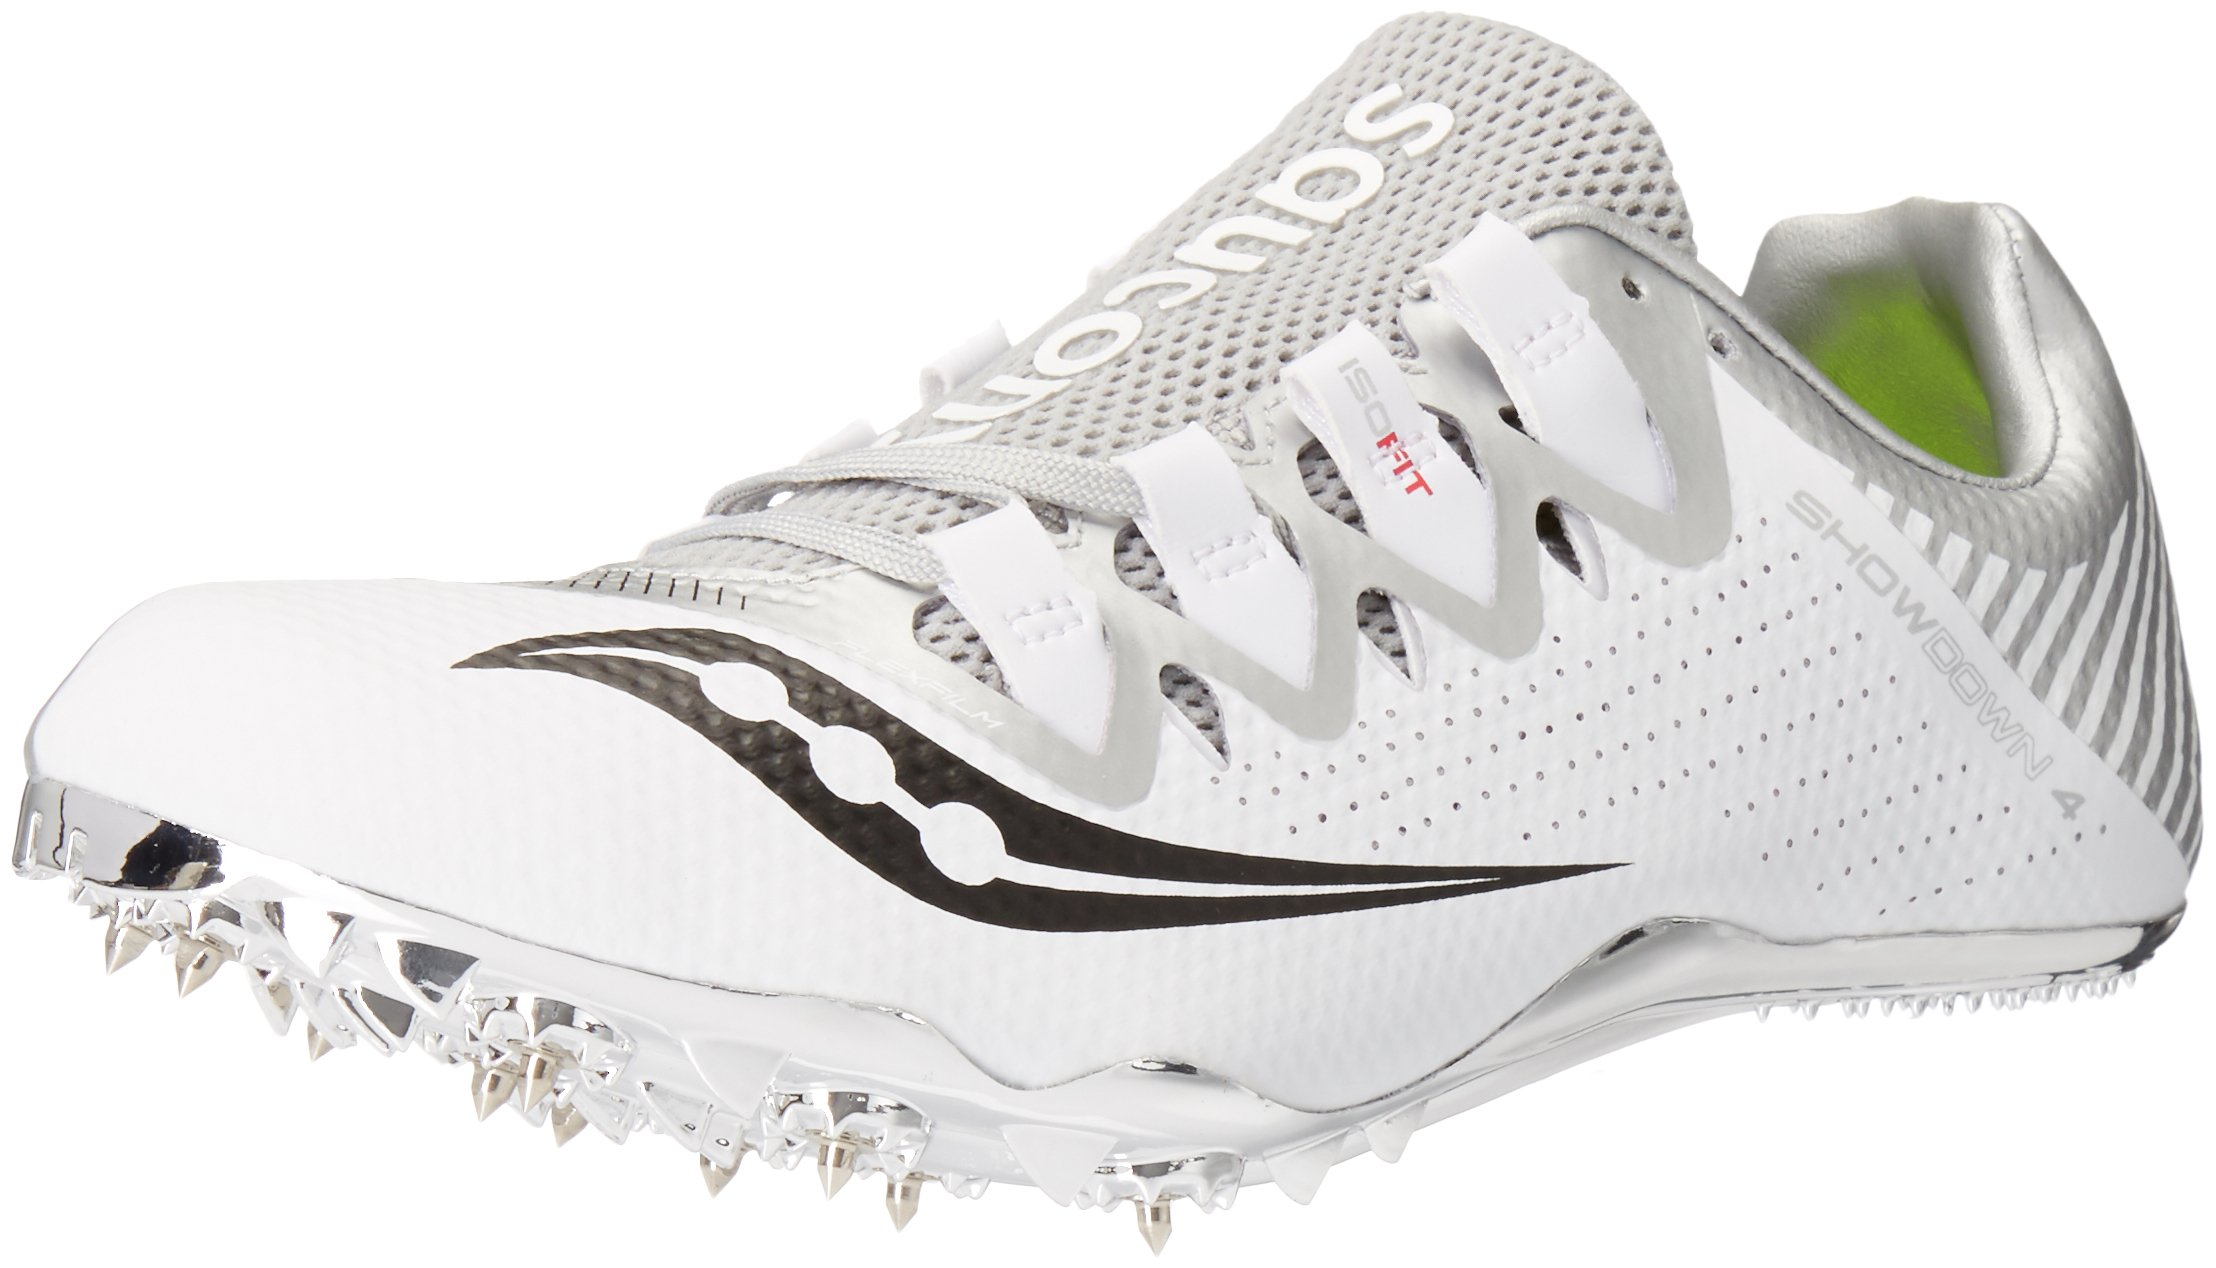 Saucony Women's Showdown 4 Track Shoe White/Silver 10 M US by Saucony (Image #1)